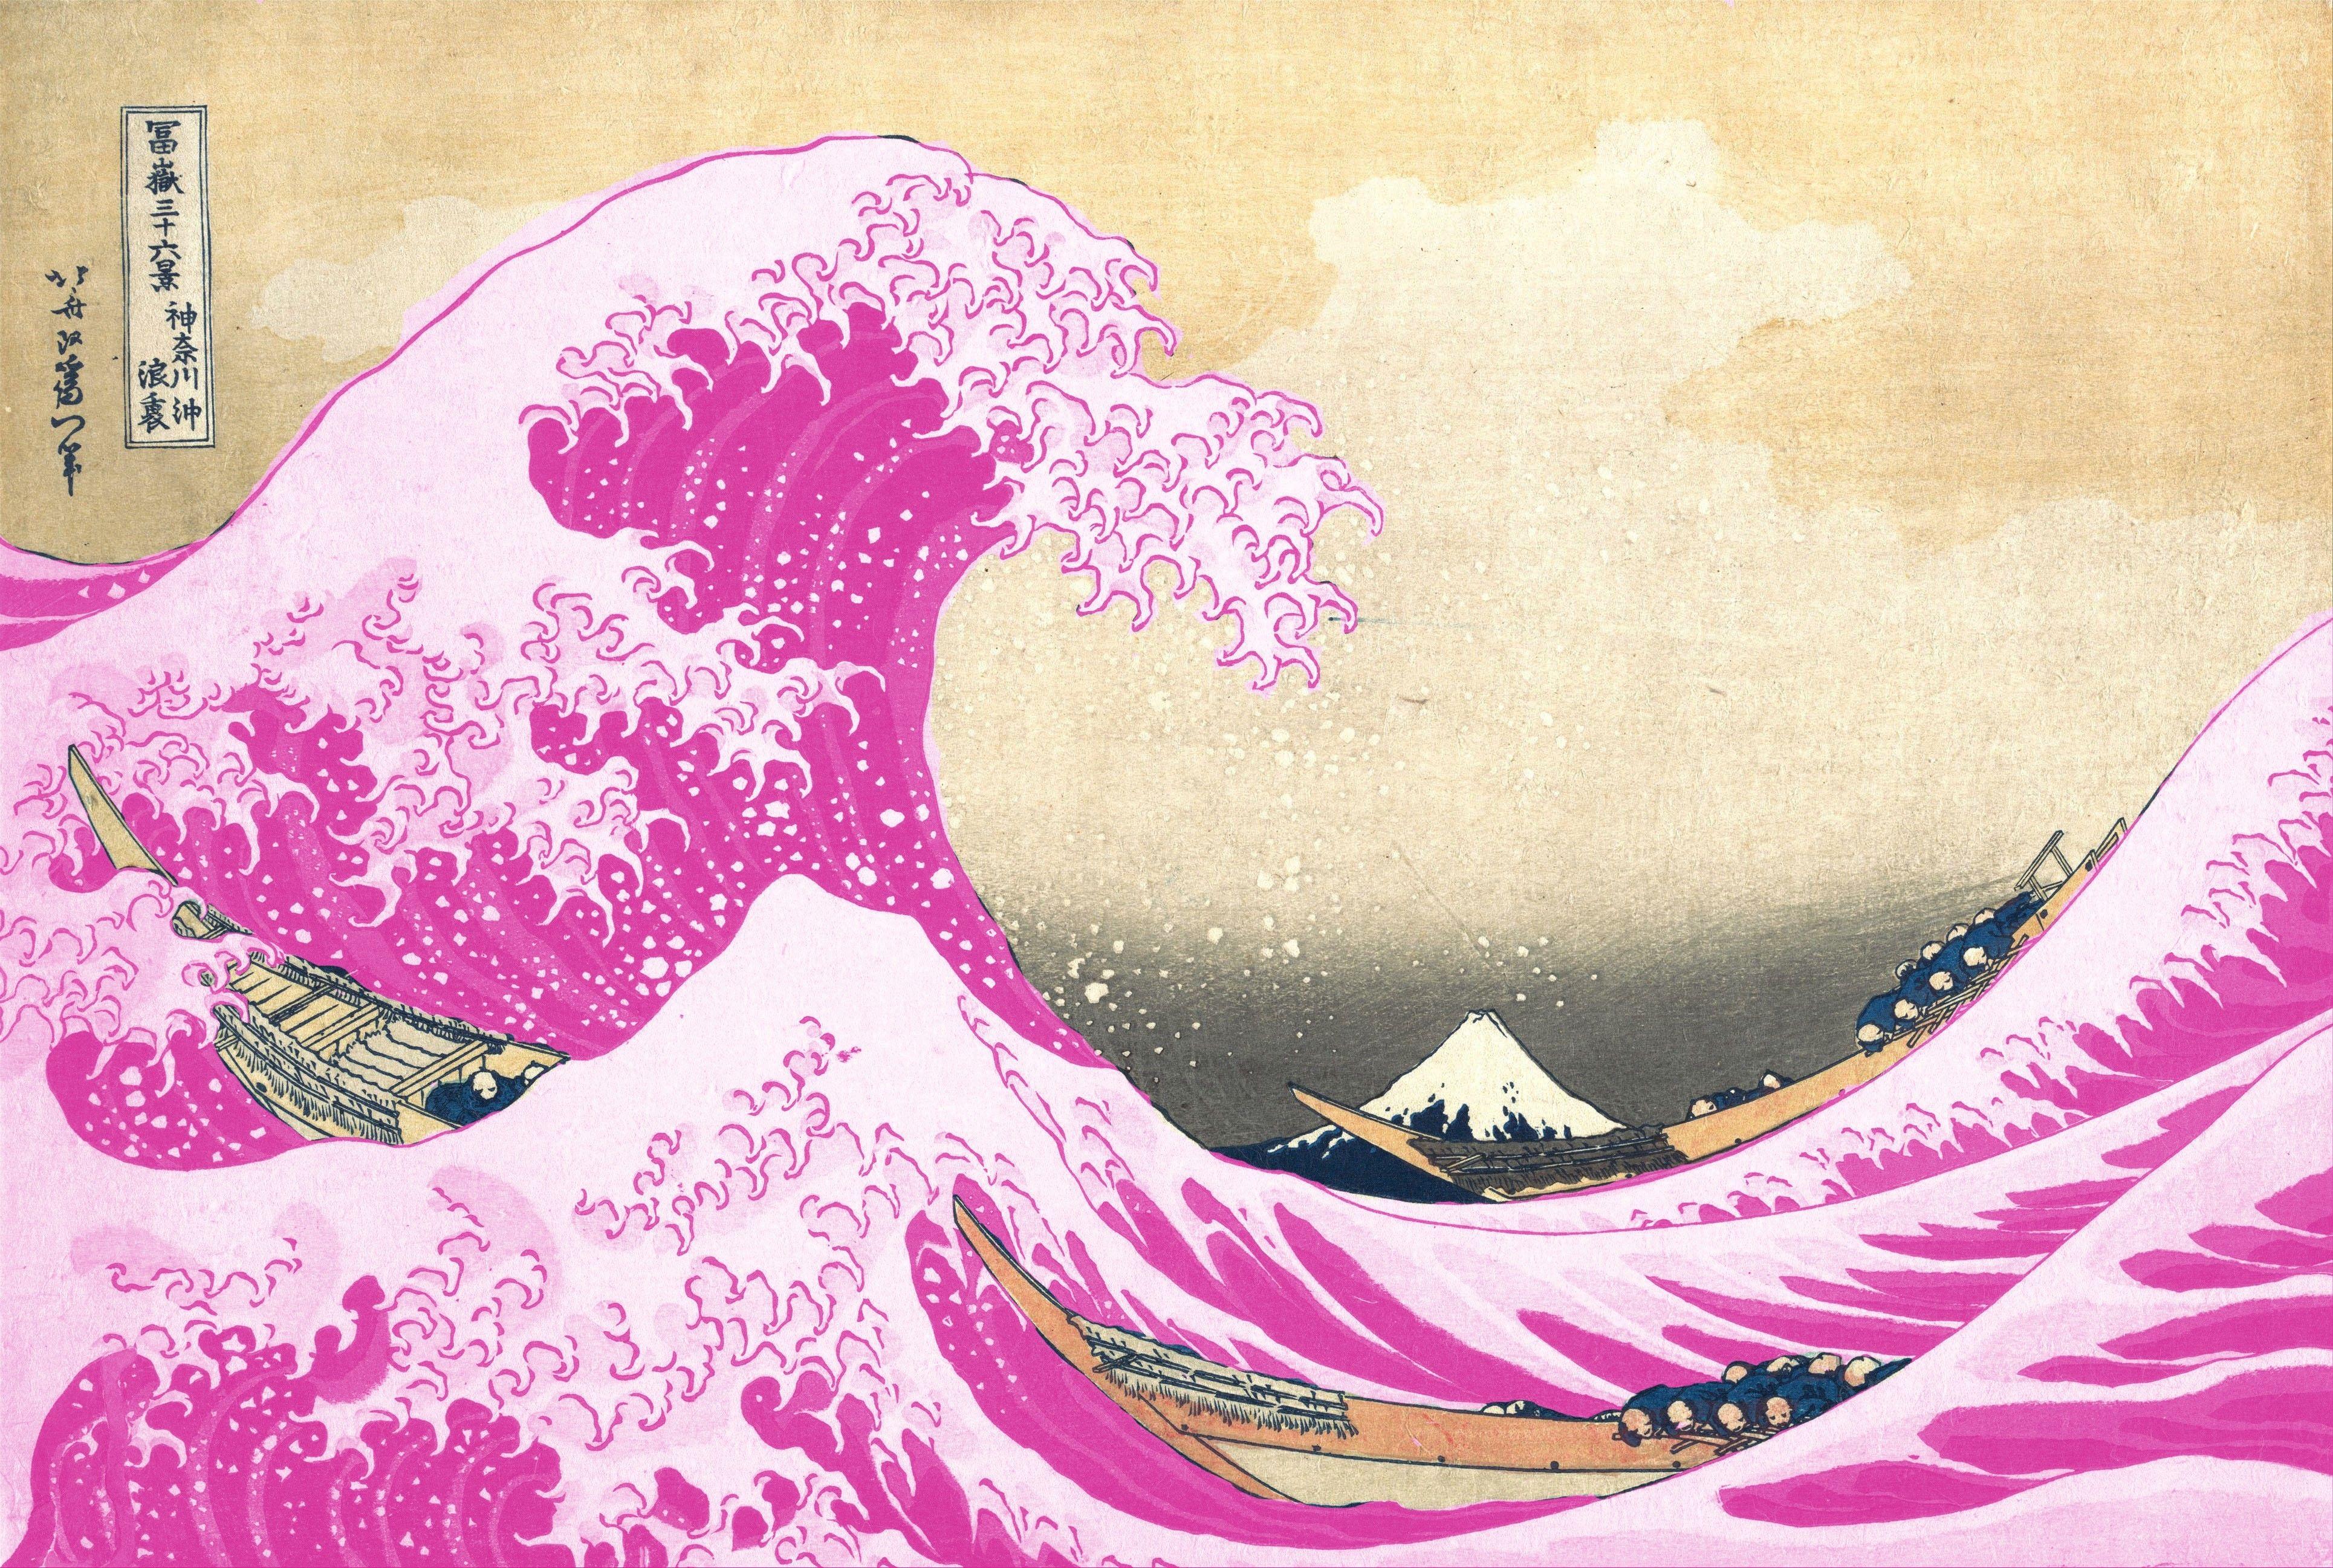 The Pink Wave Was Always Blue Wave Art Waves Wallpaper Waves Cartoon